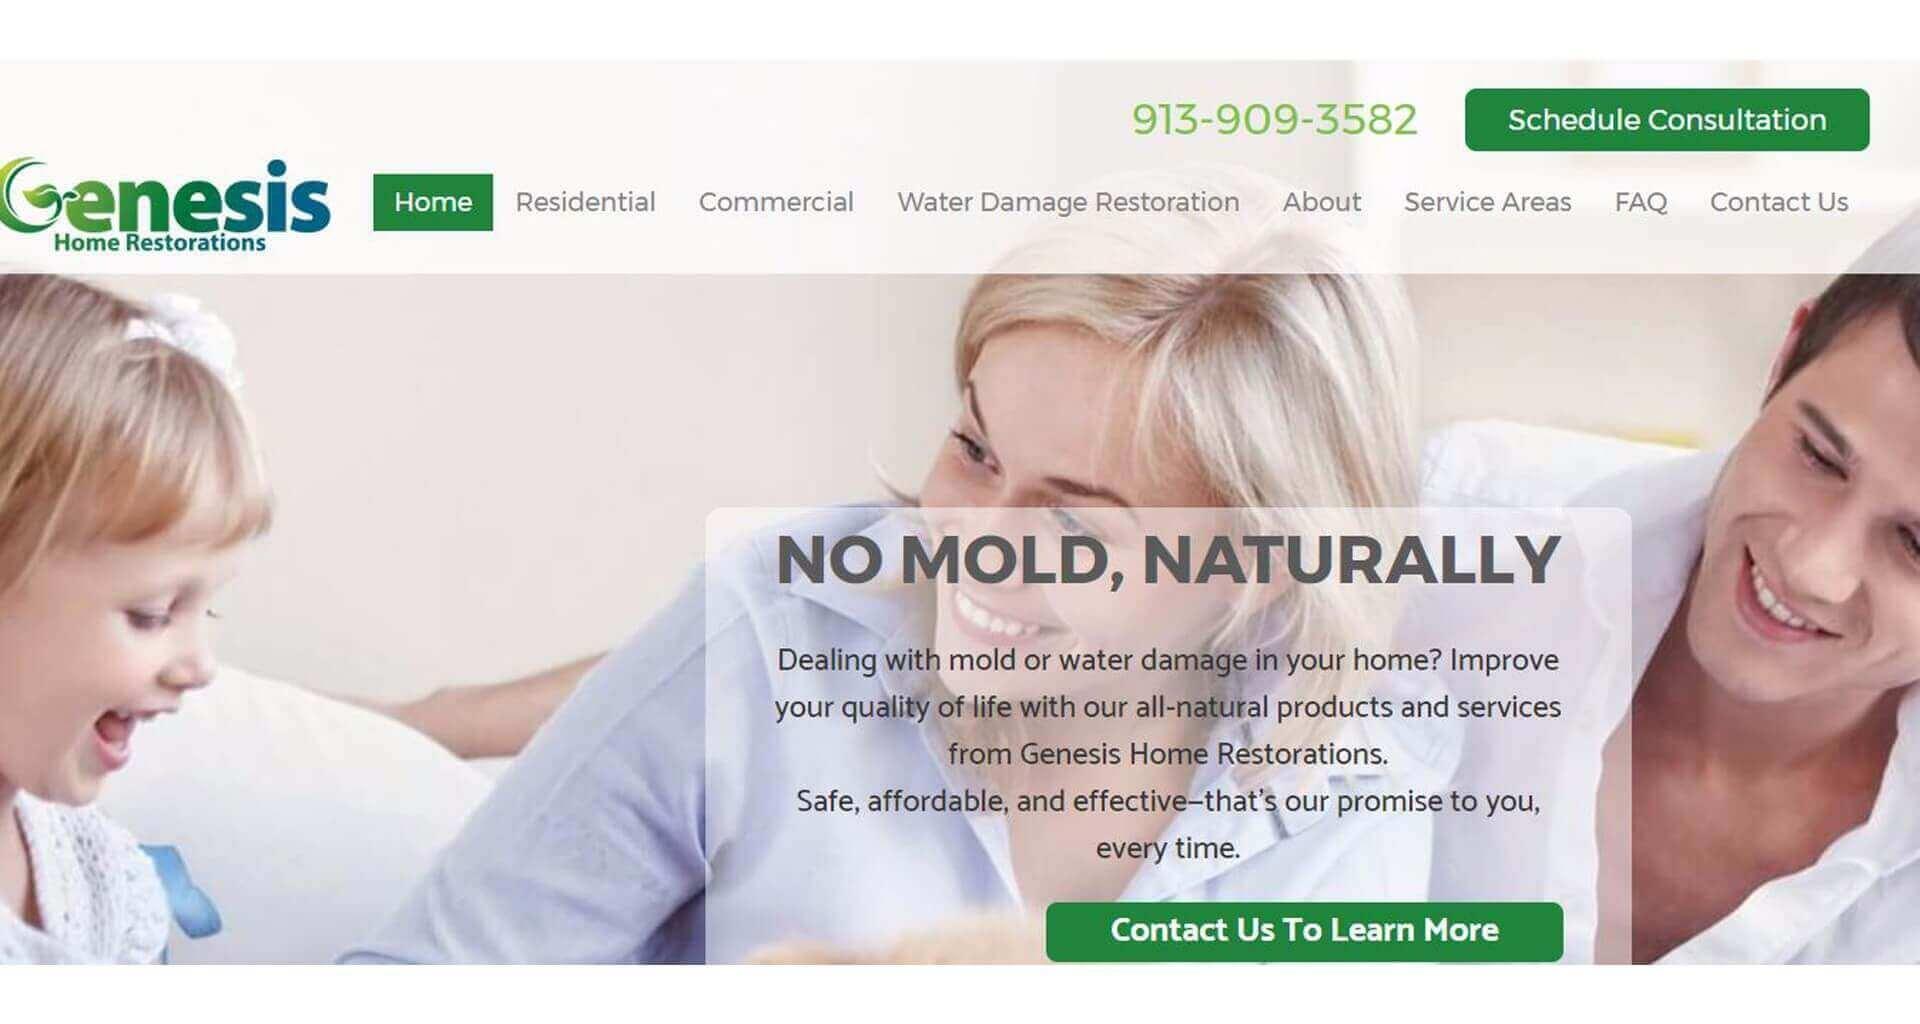 Genesis Home Restorations - Case Study